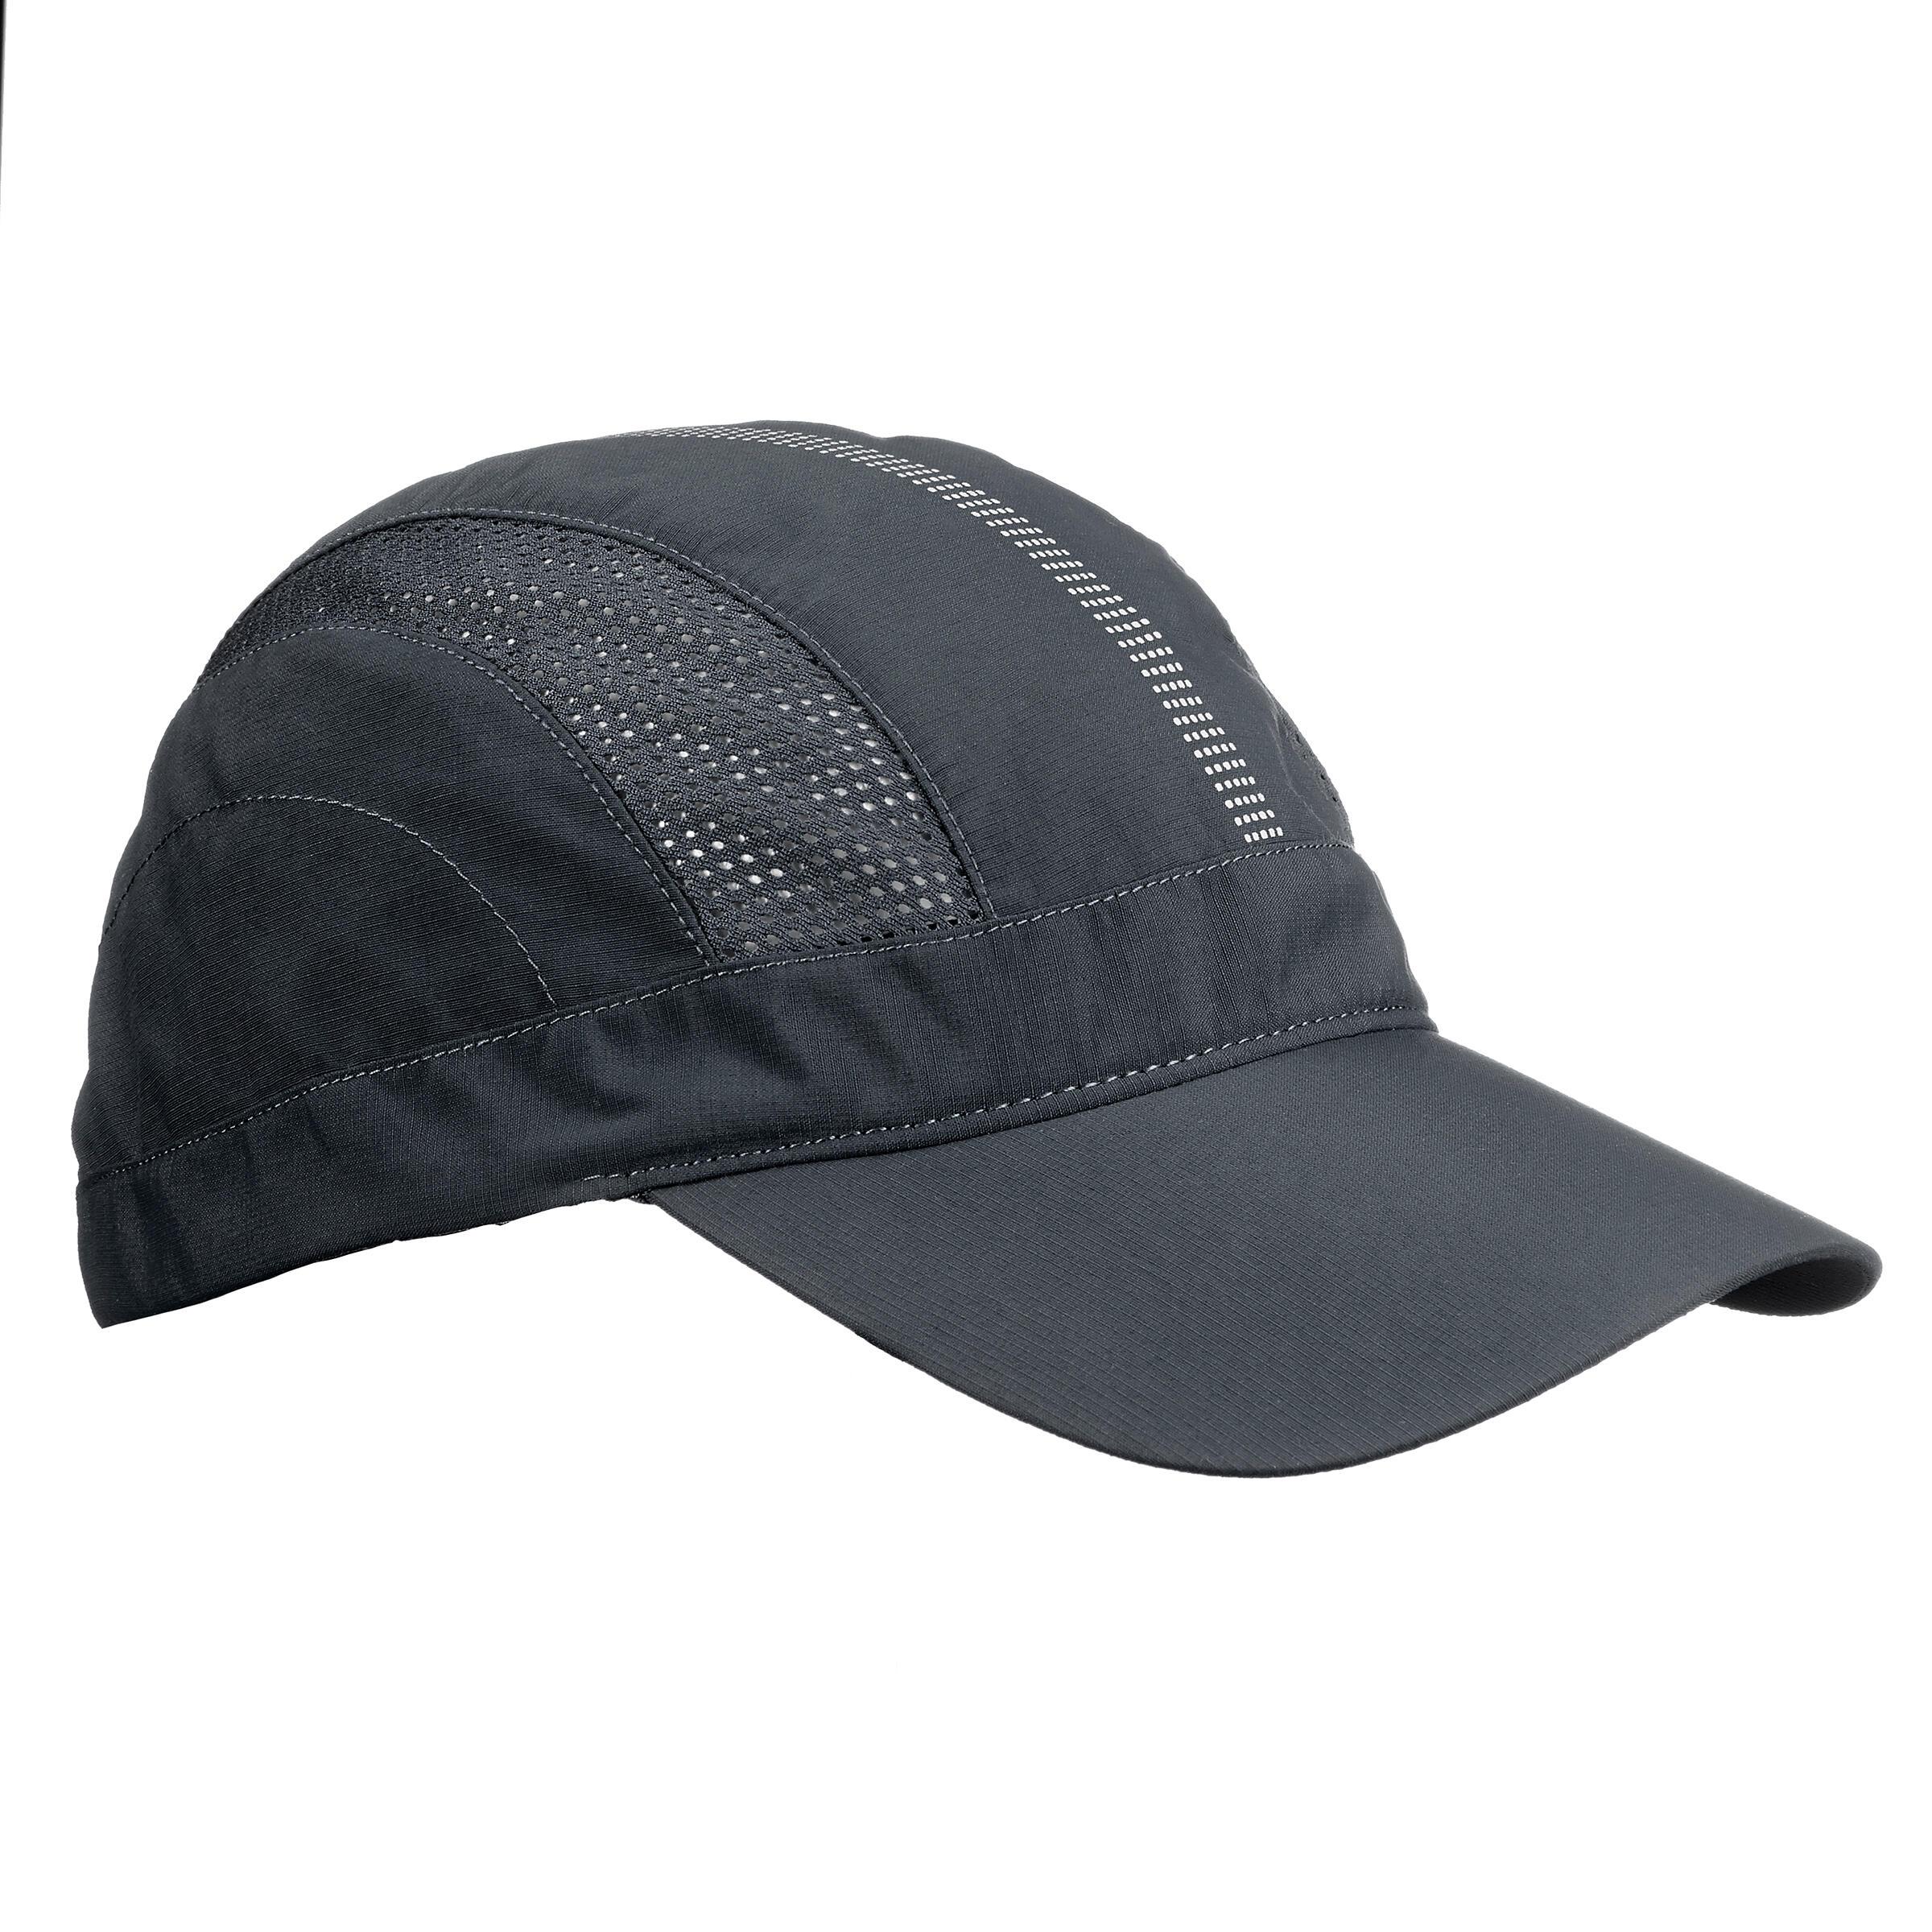 Schirmmütze Cap Trek 500 belüftet dunkelgrau